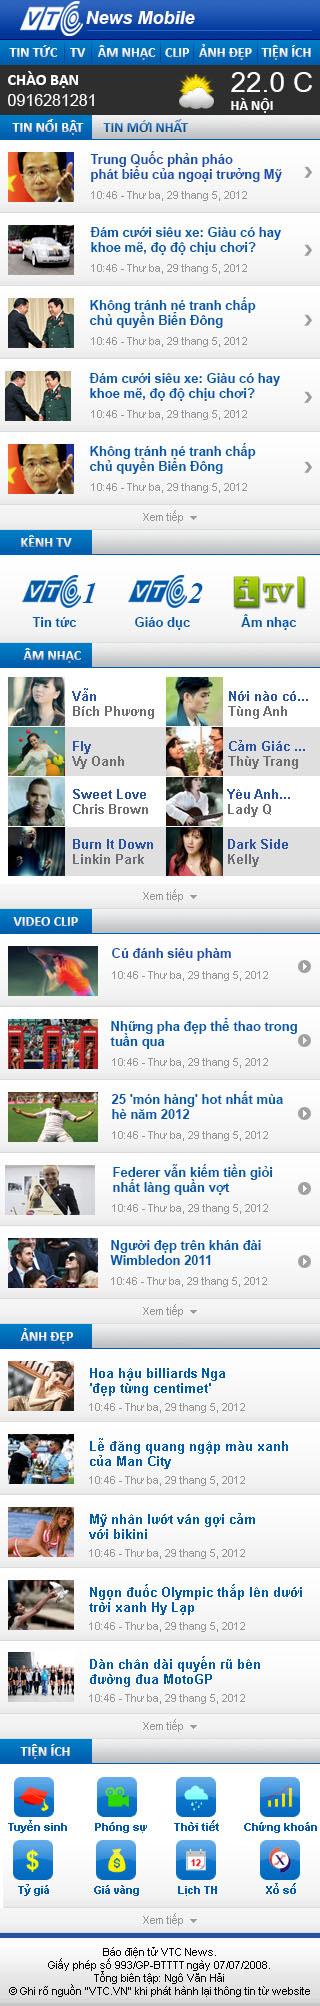 VTC mobile news